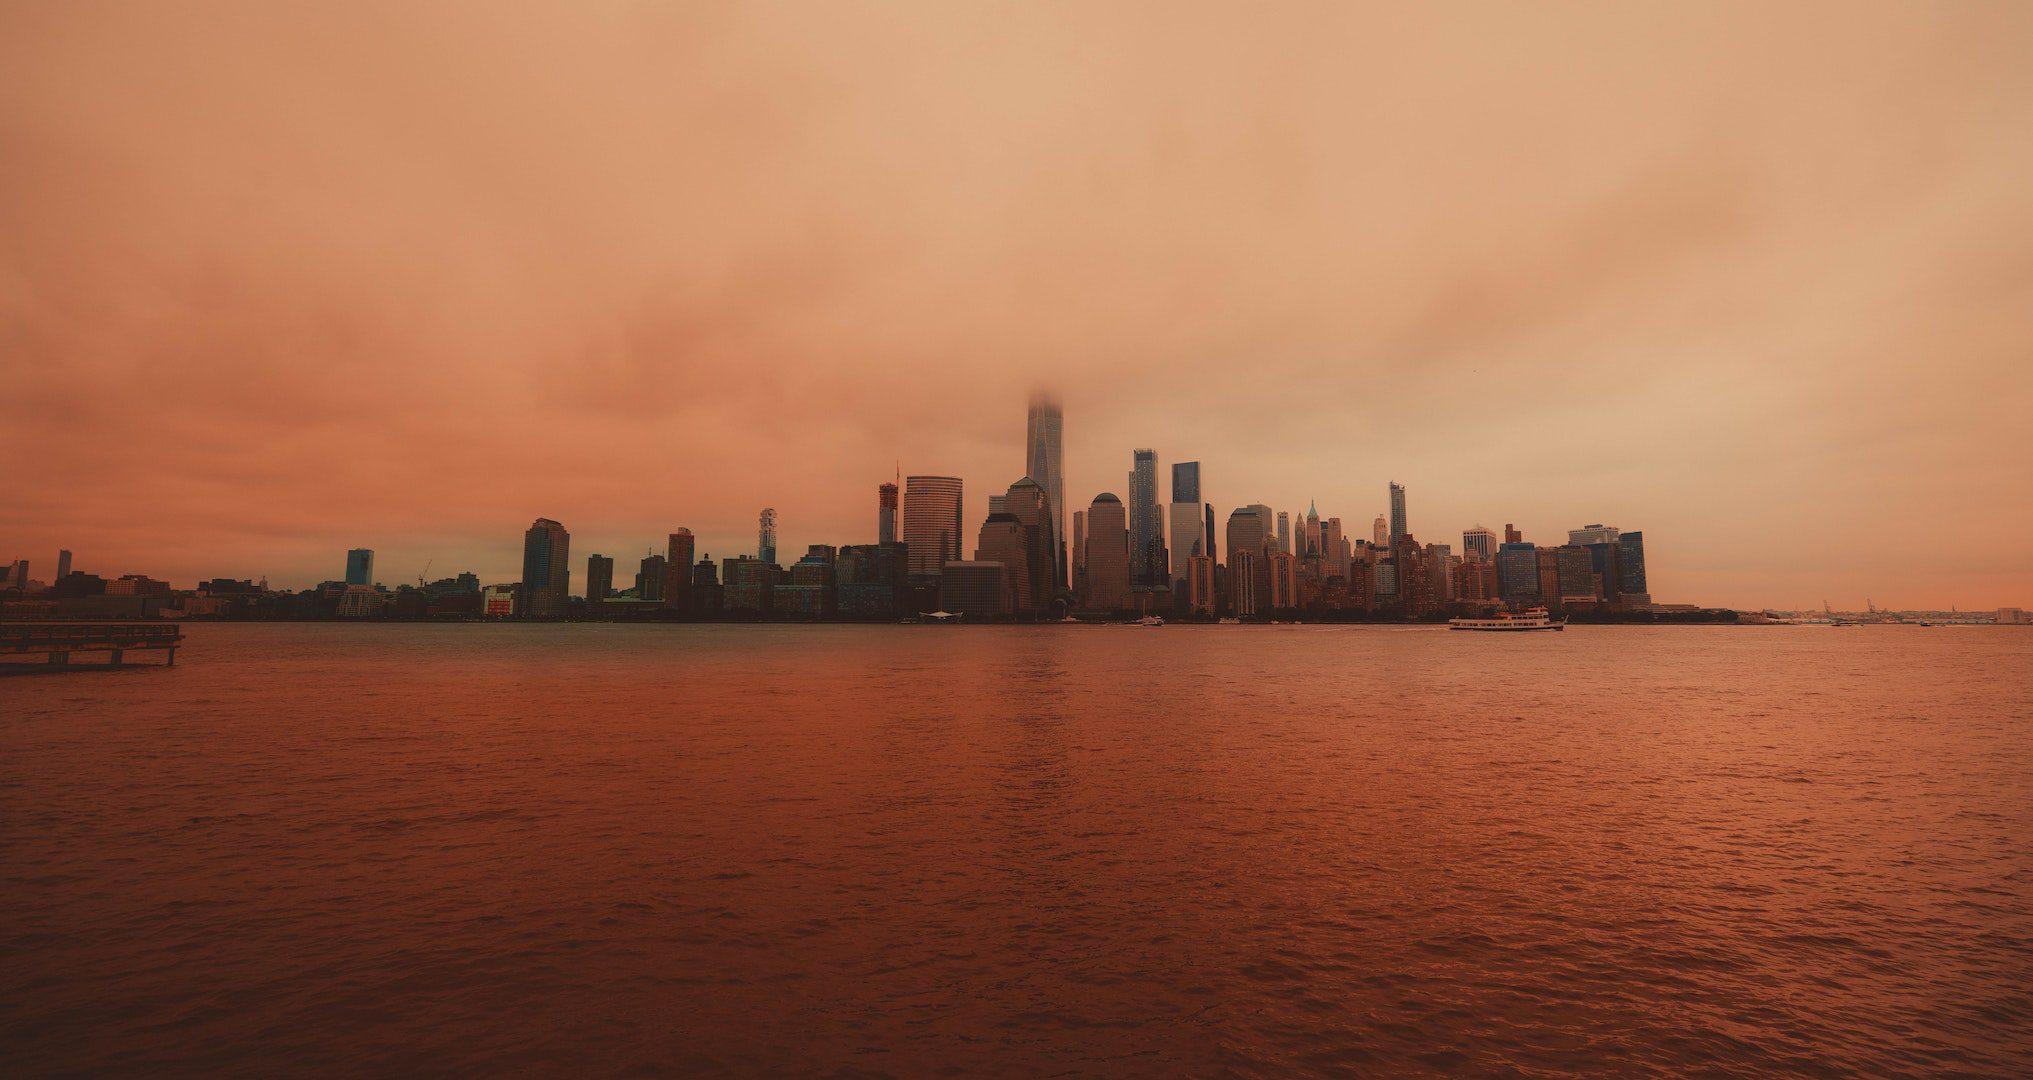 new york city skyline and harbor with orange sunset